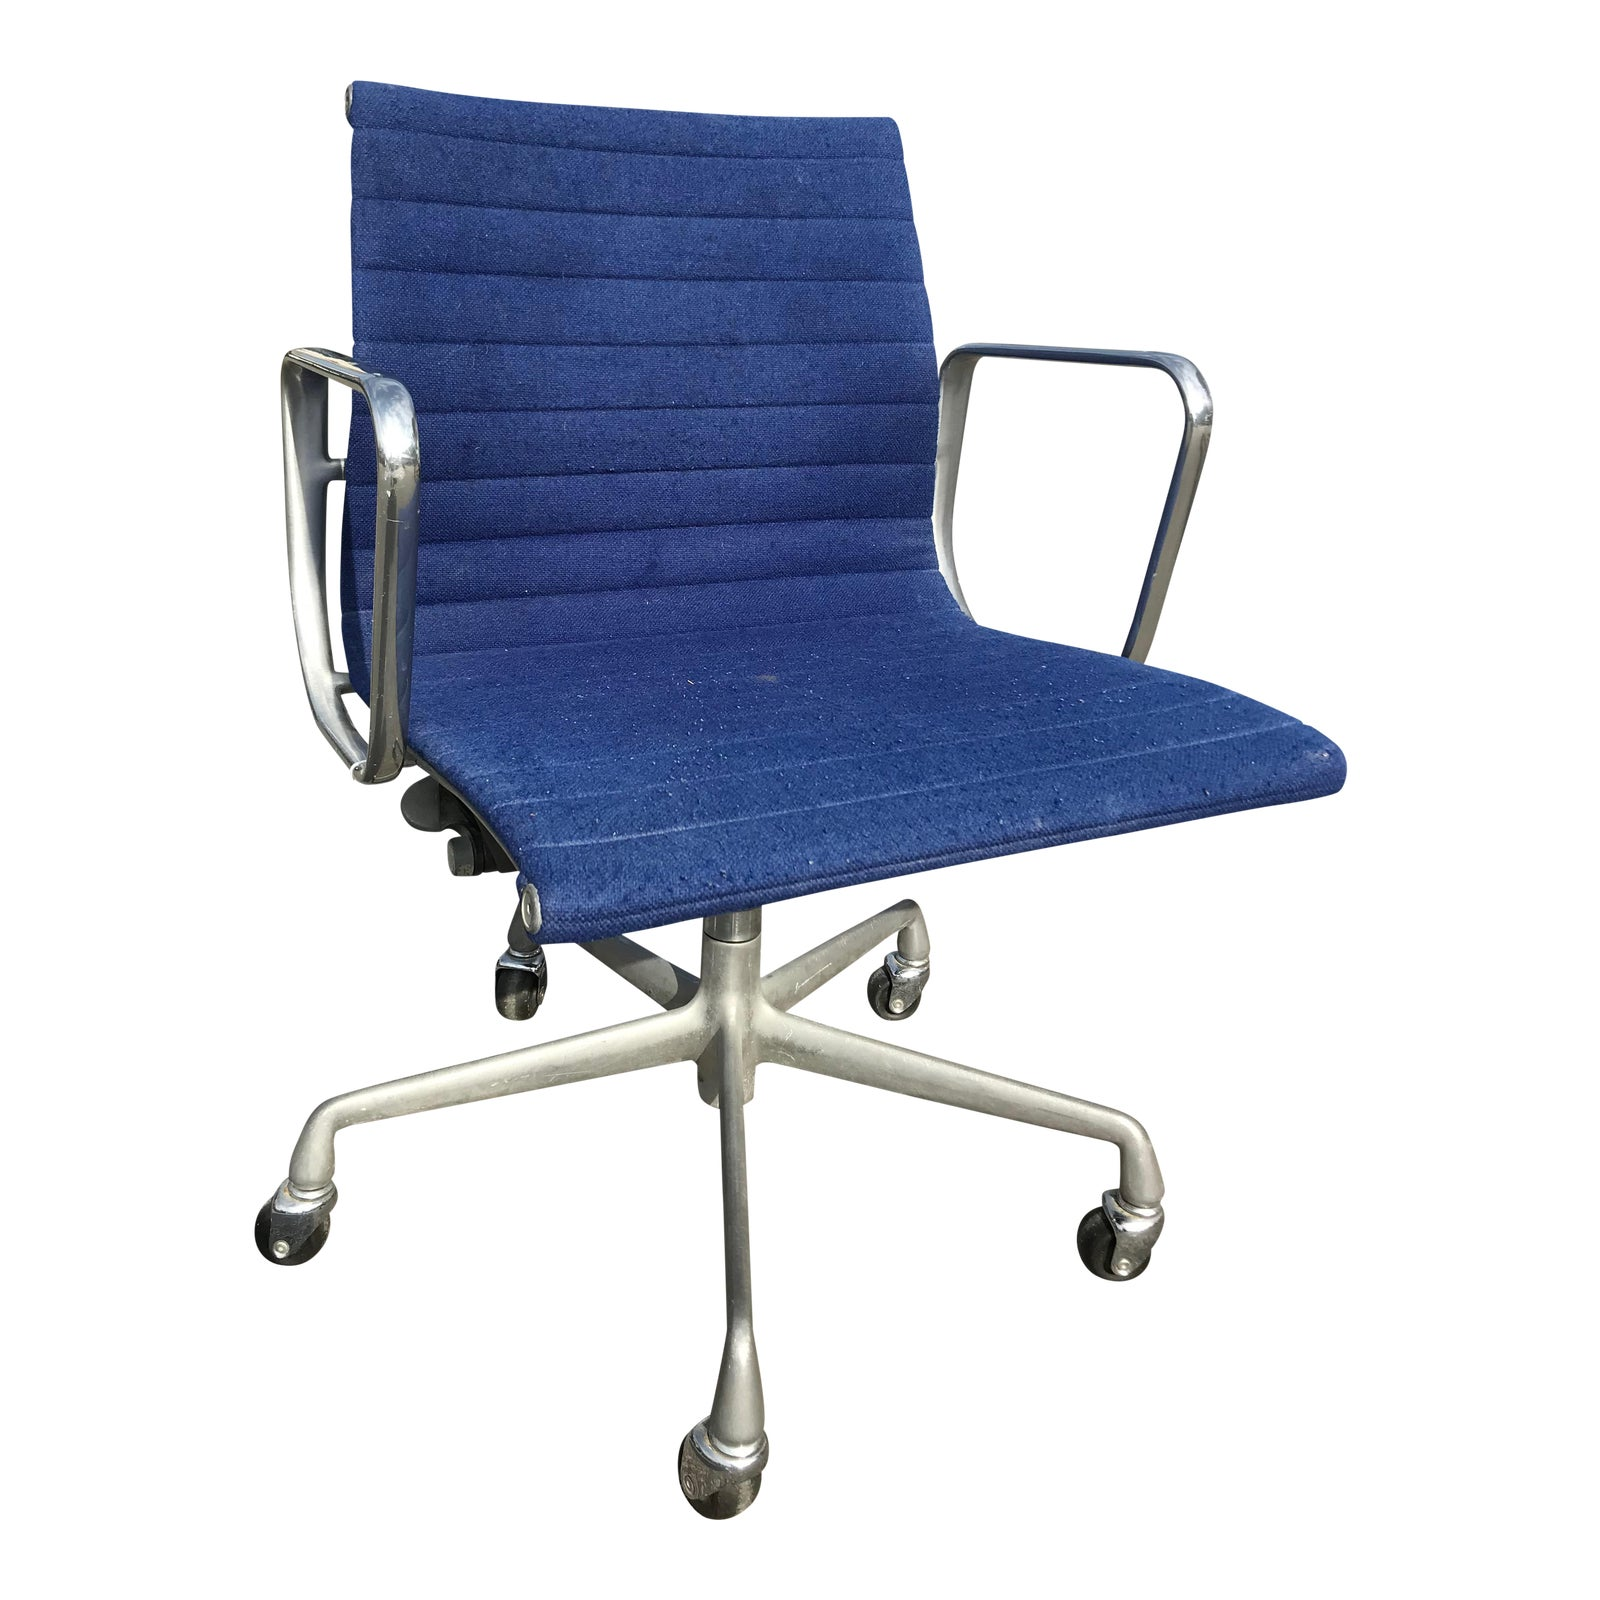 1980S Herman Miller Eames Blue Upholstered Aluminum Group Chair -